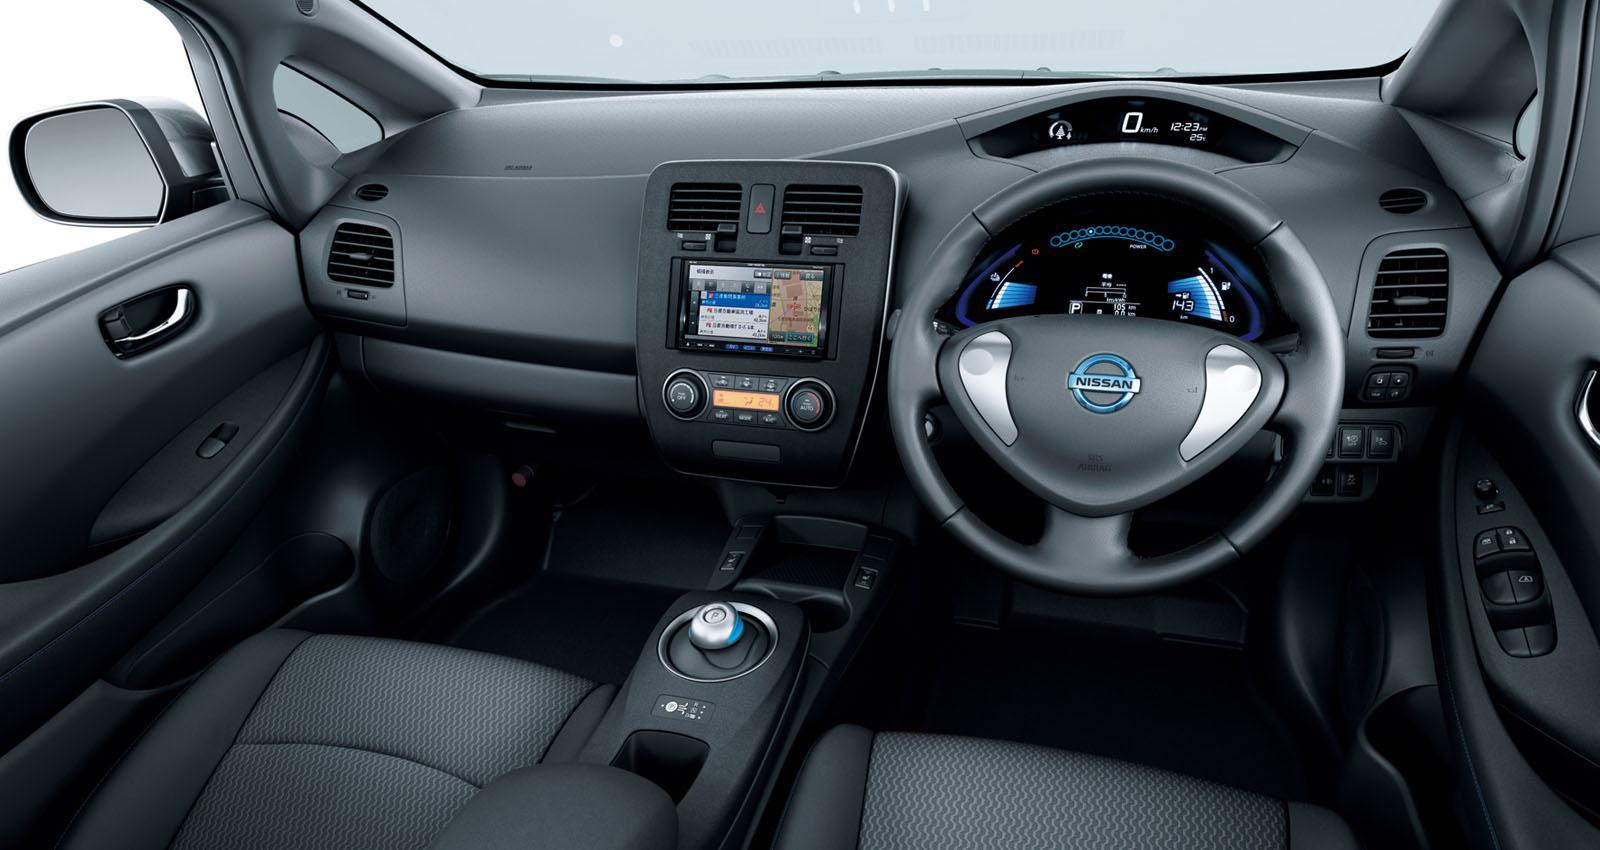 2013 Nissan Leaf interior view